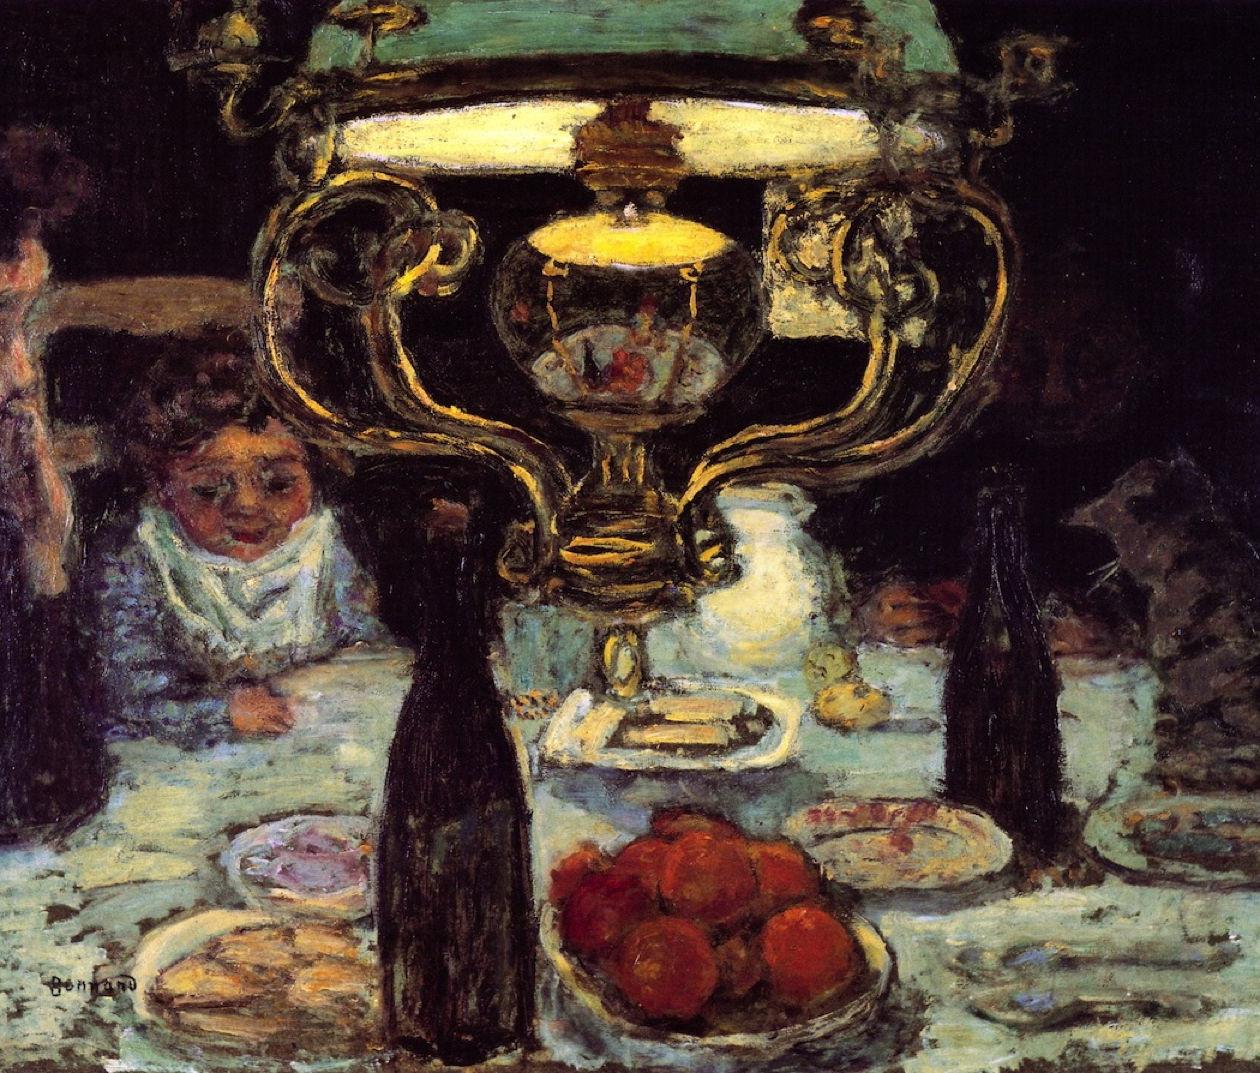 Pierre Bonnard, La Lampe, 1899 ca. Flint Institute of Arts, Flint (Michigan)